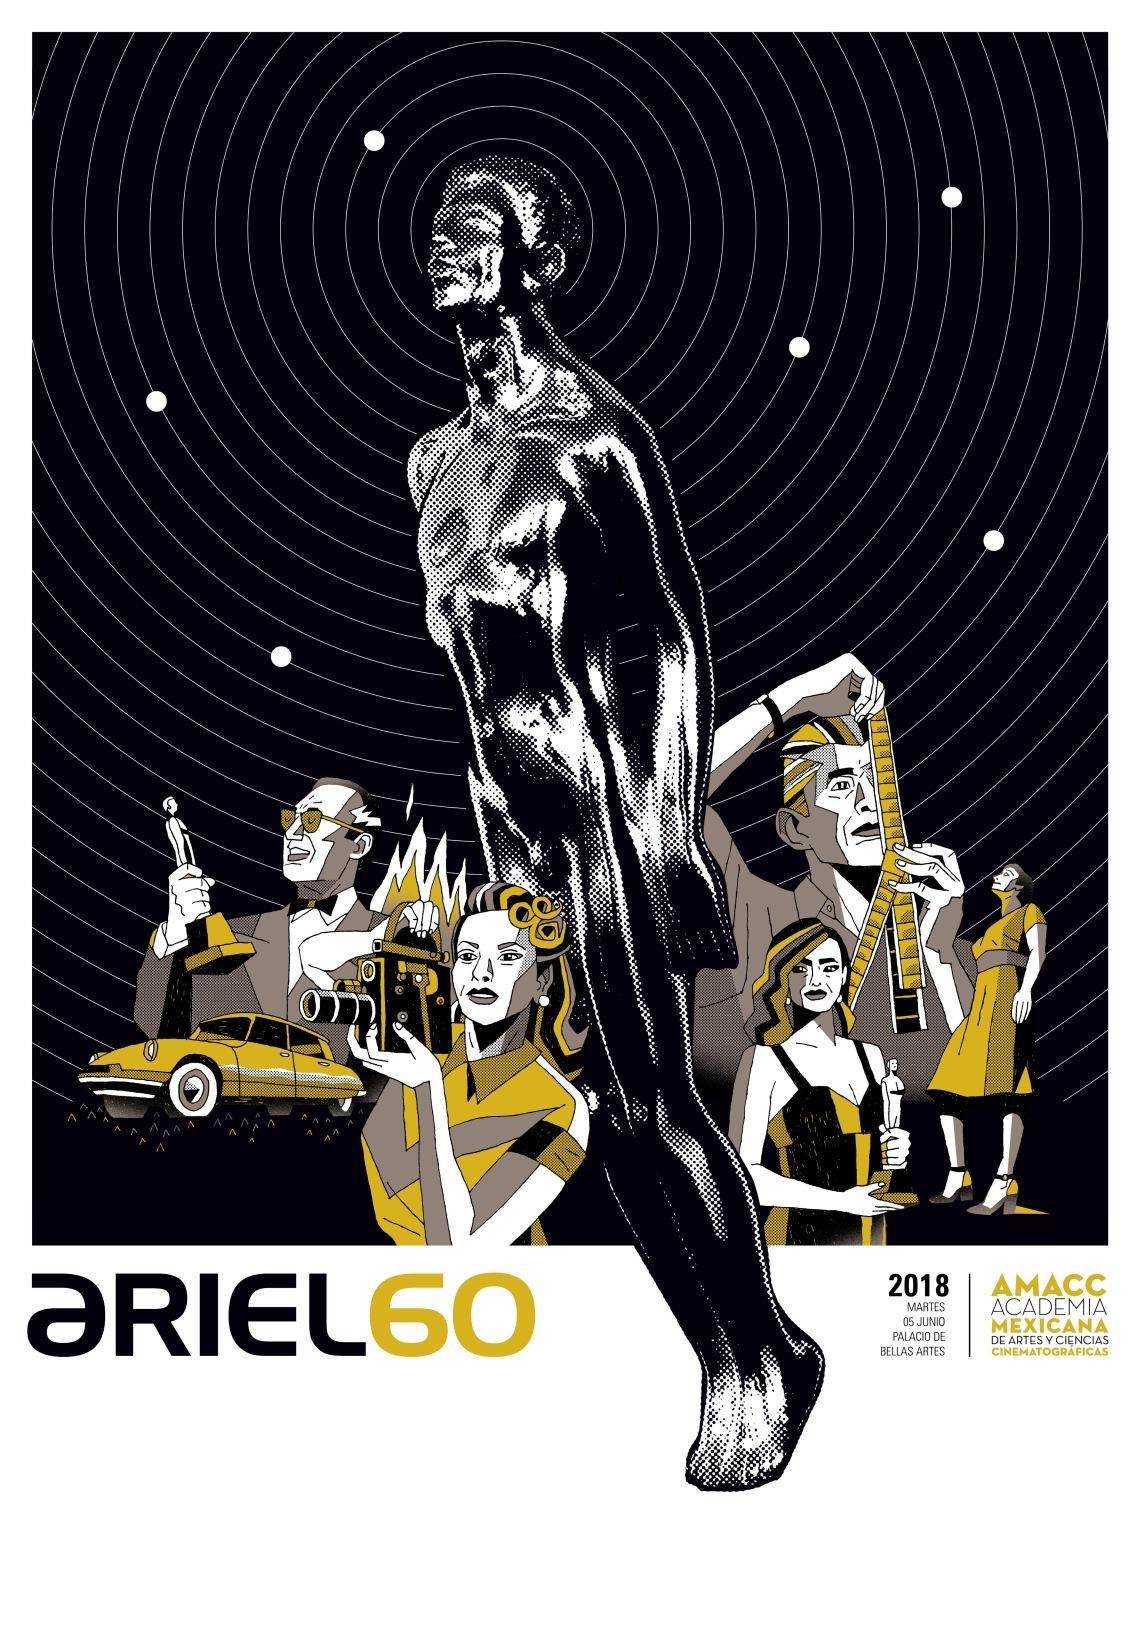 ARIEL-60